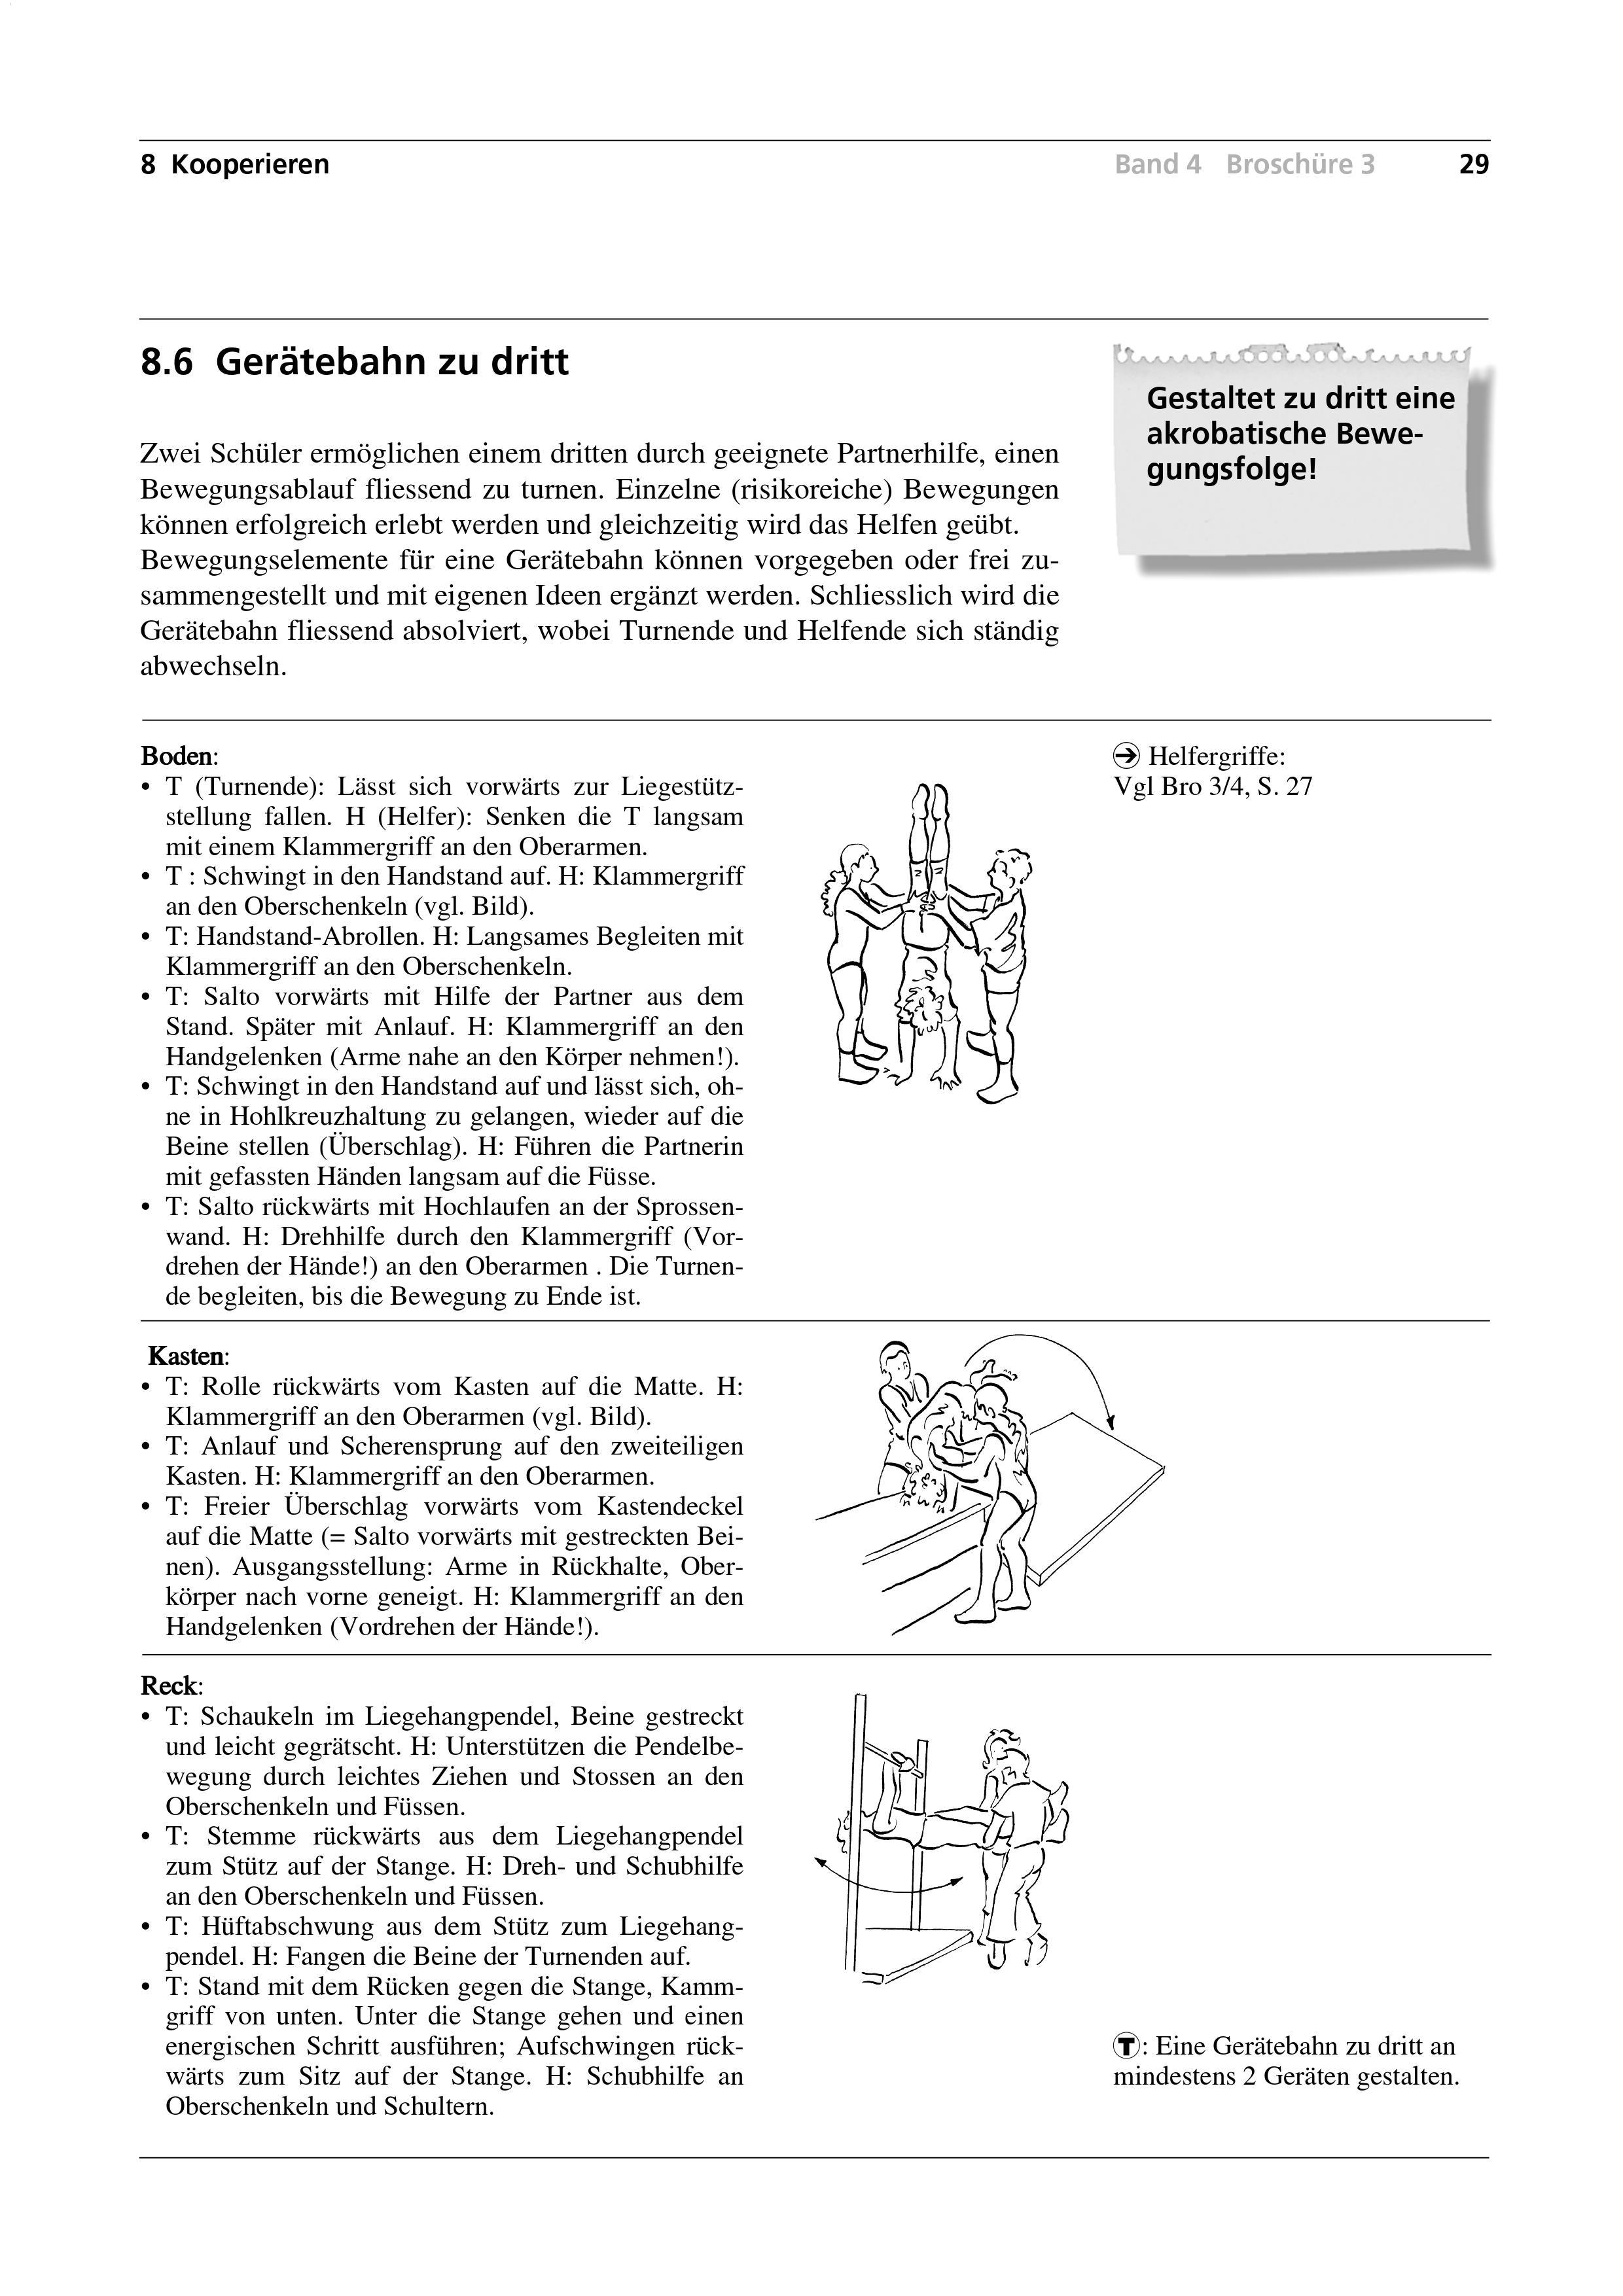 Preview image for LOM object Gerätebahn zu dritt